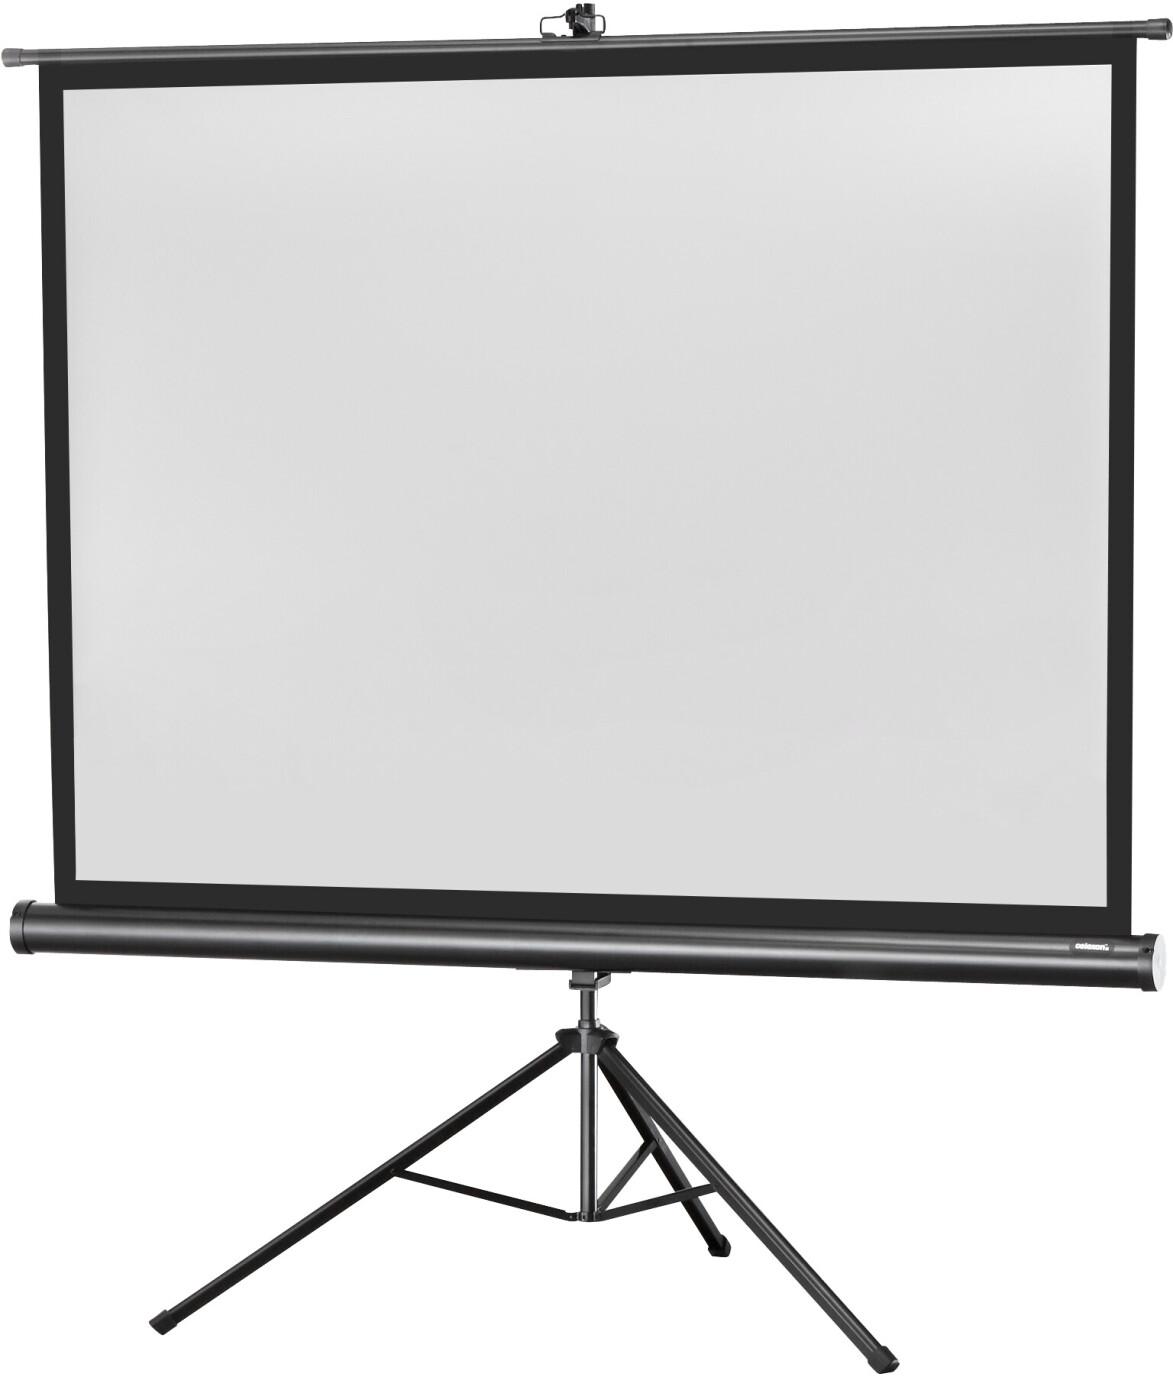 celexon Stativleinwand Economy 244 x 183 cm